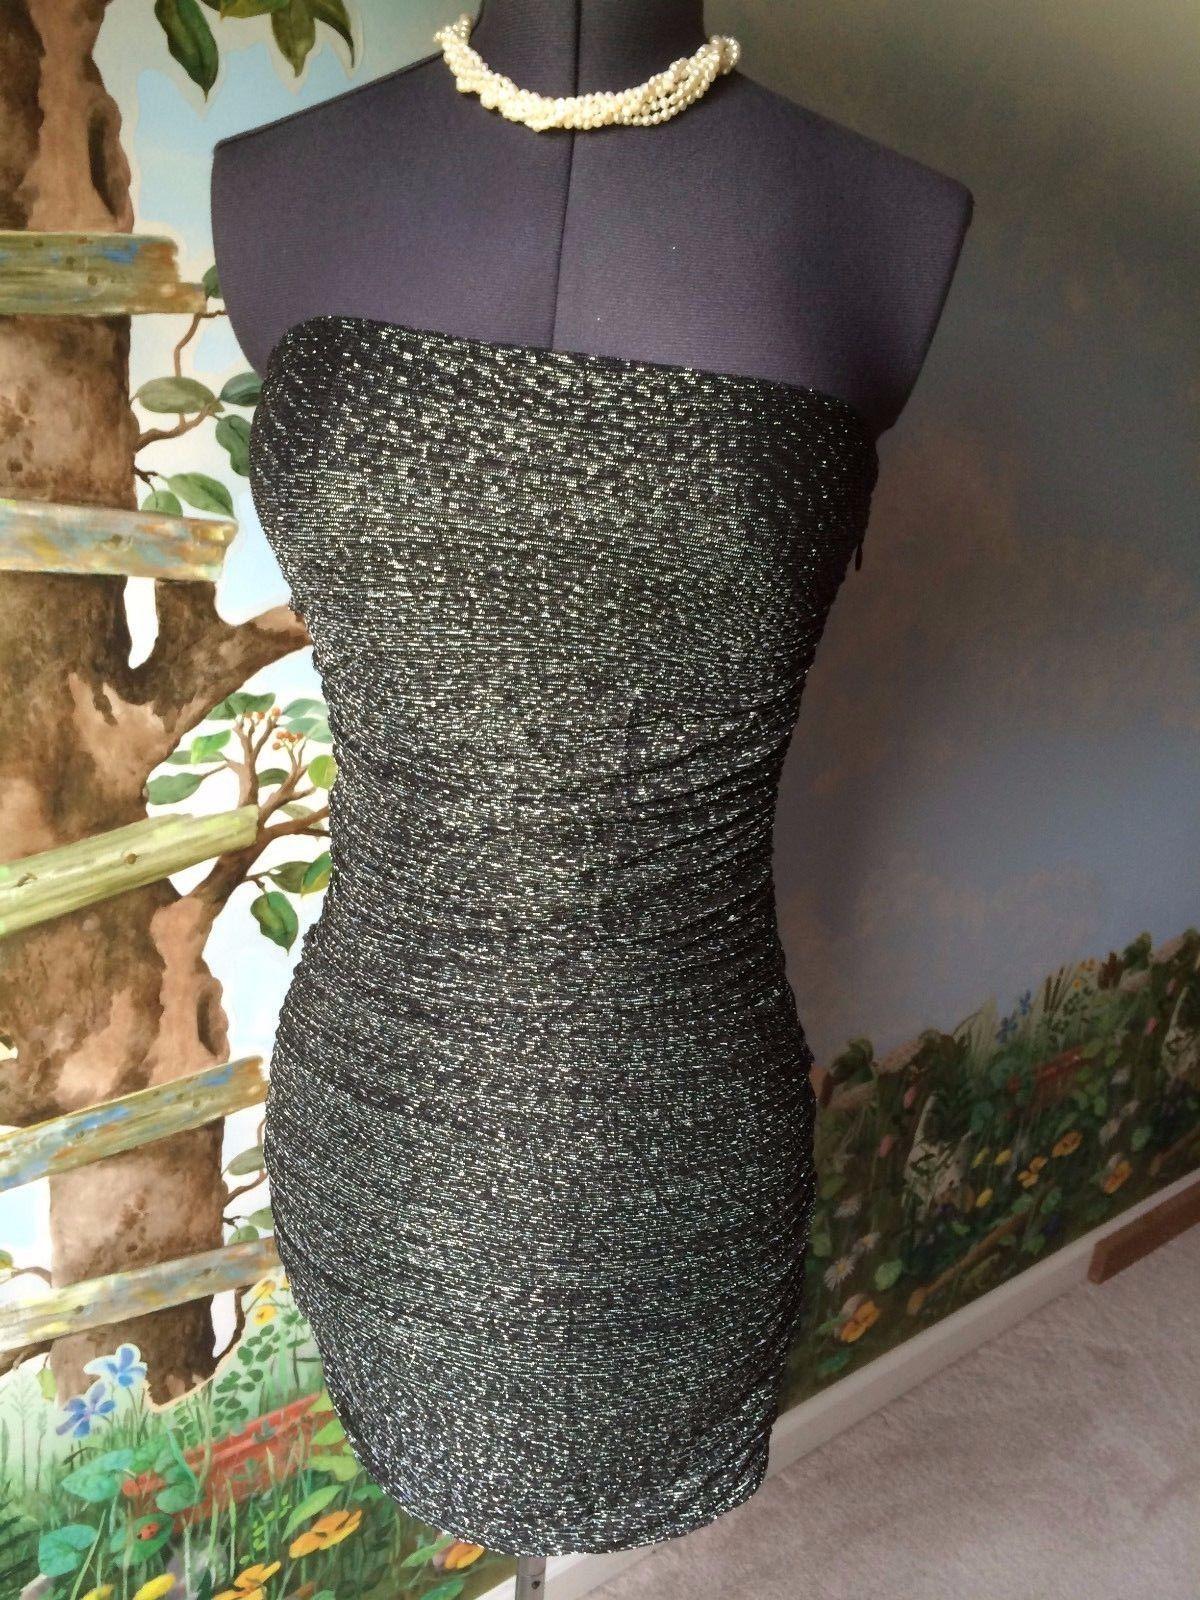 Express Women's Black & Silver Strapless Cocktail Dress SZ M NWT image 9